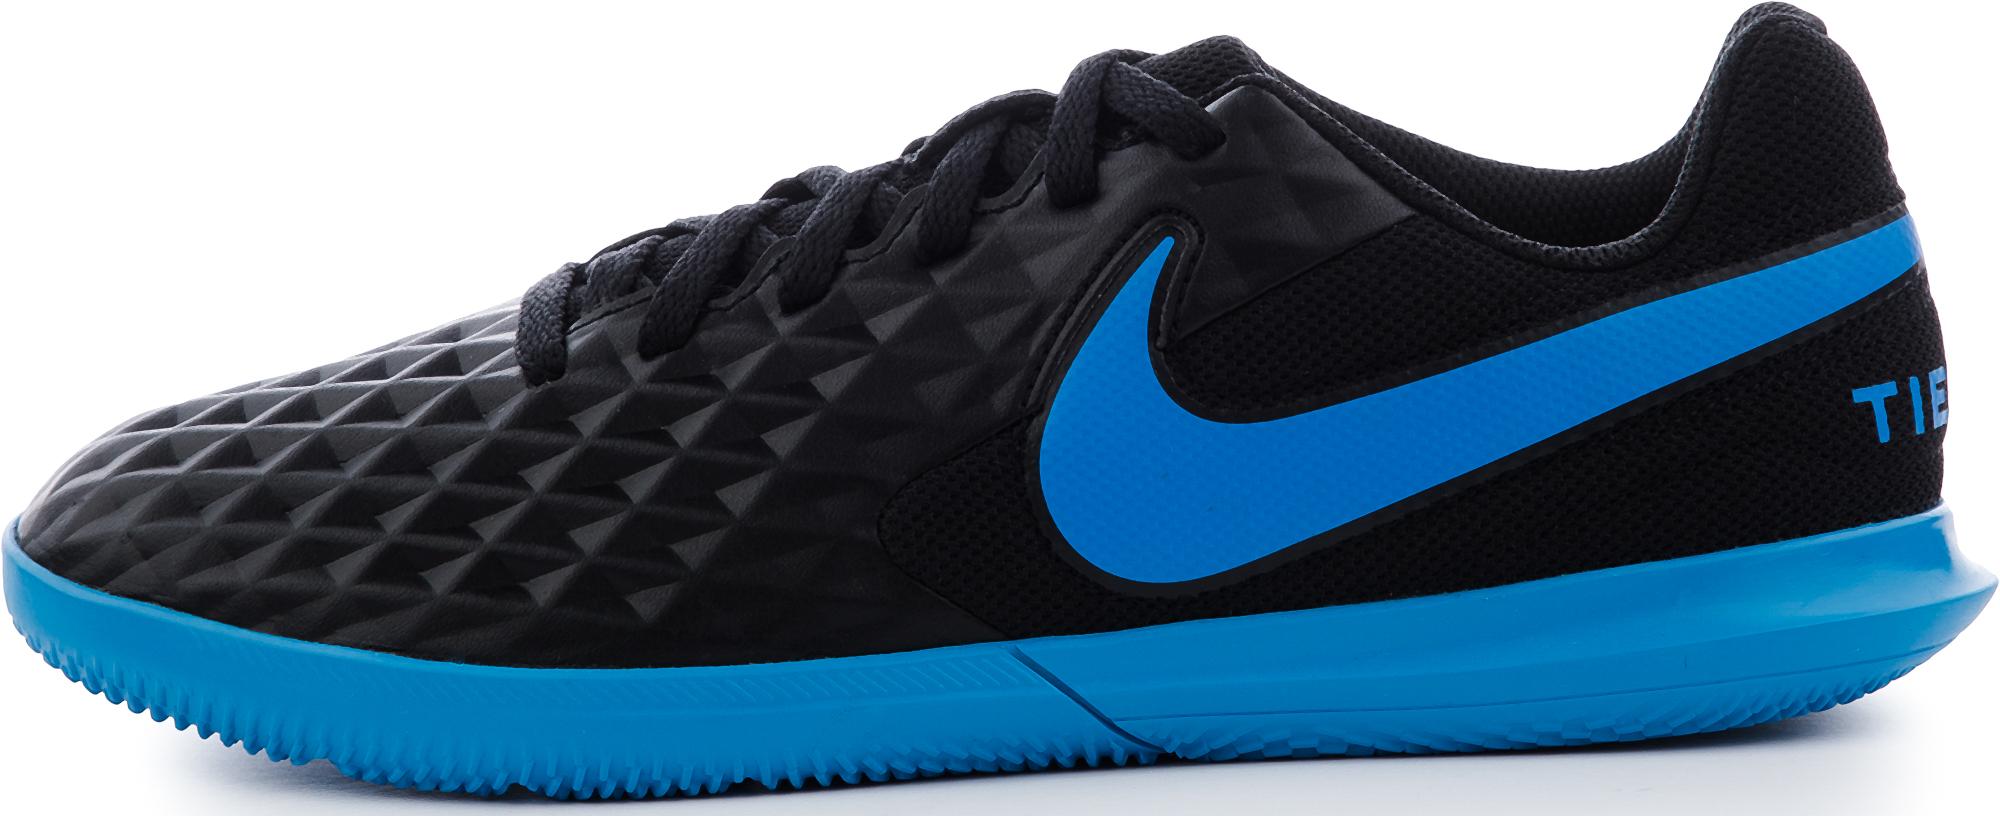 Nike Бутсы детские Jr. Tiempo Legend IC, размер 37.5